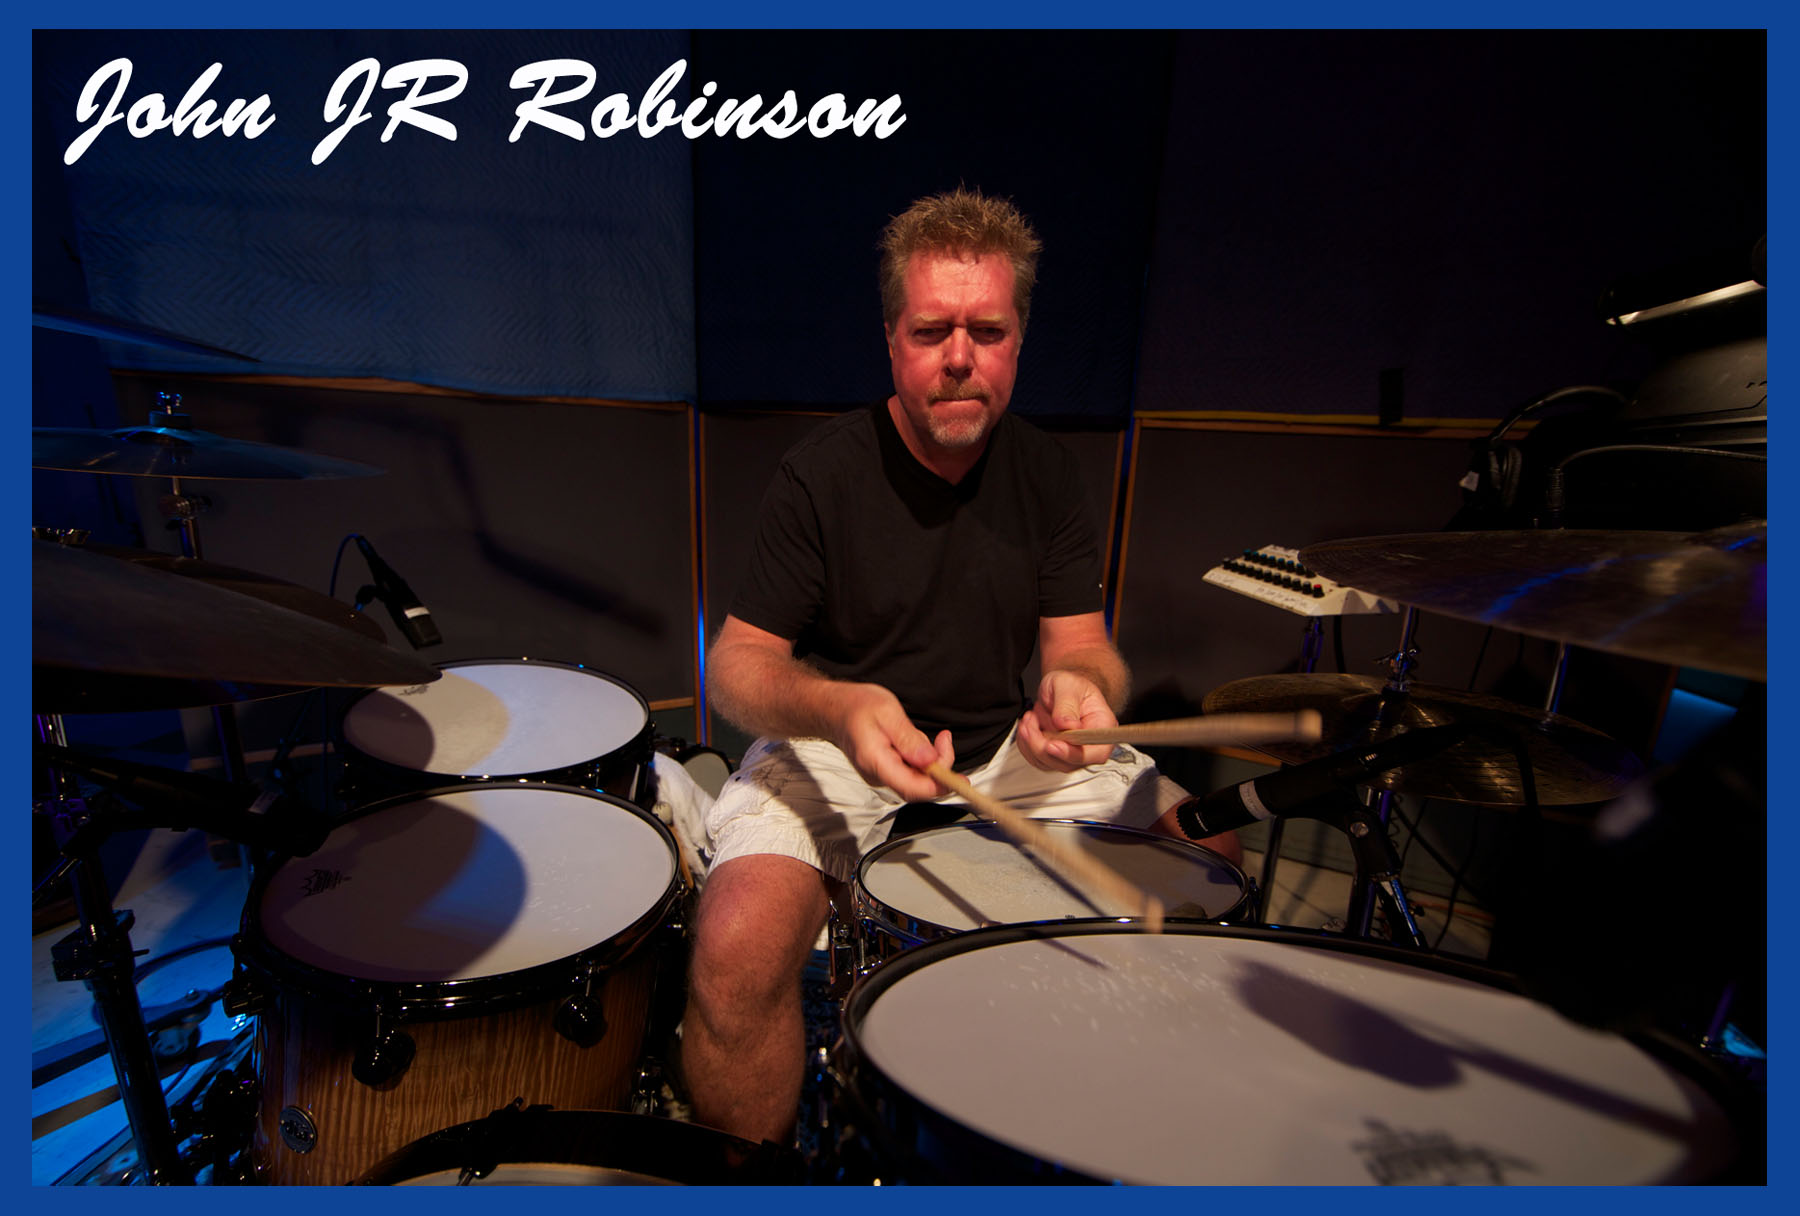 John-JR_Robinson.jpg